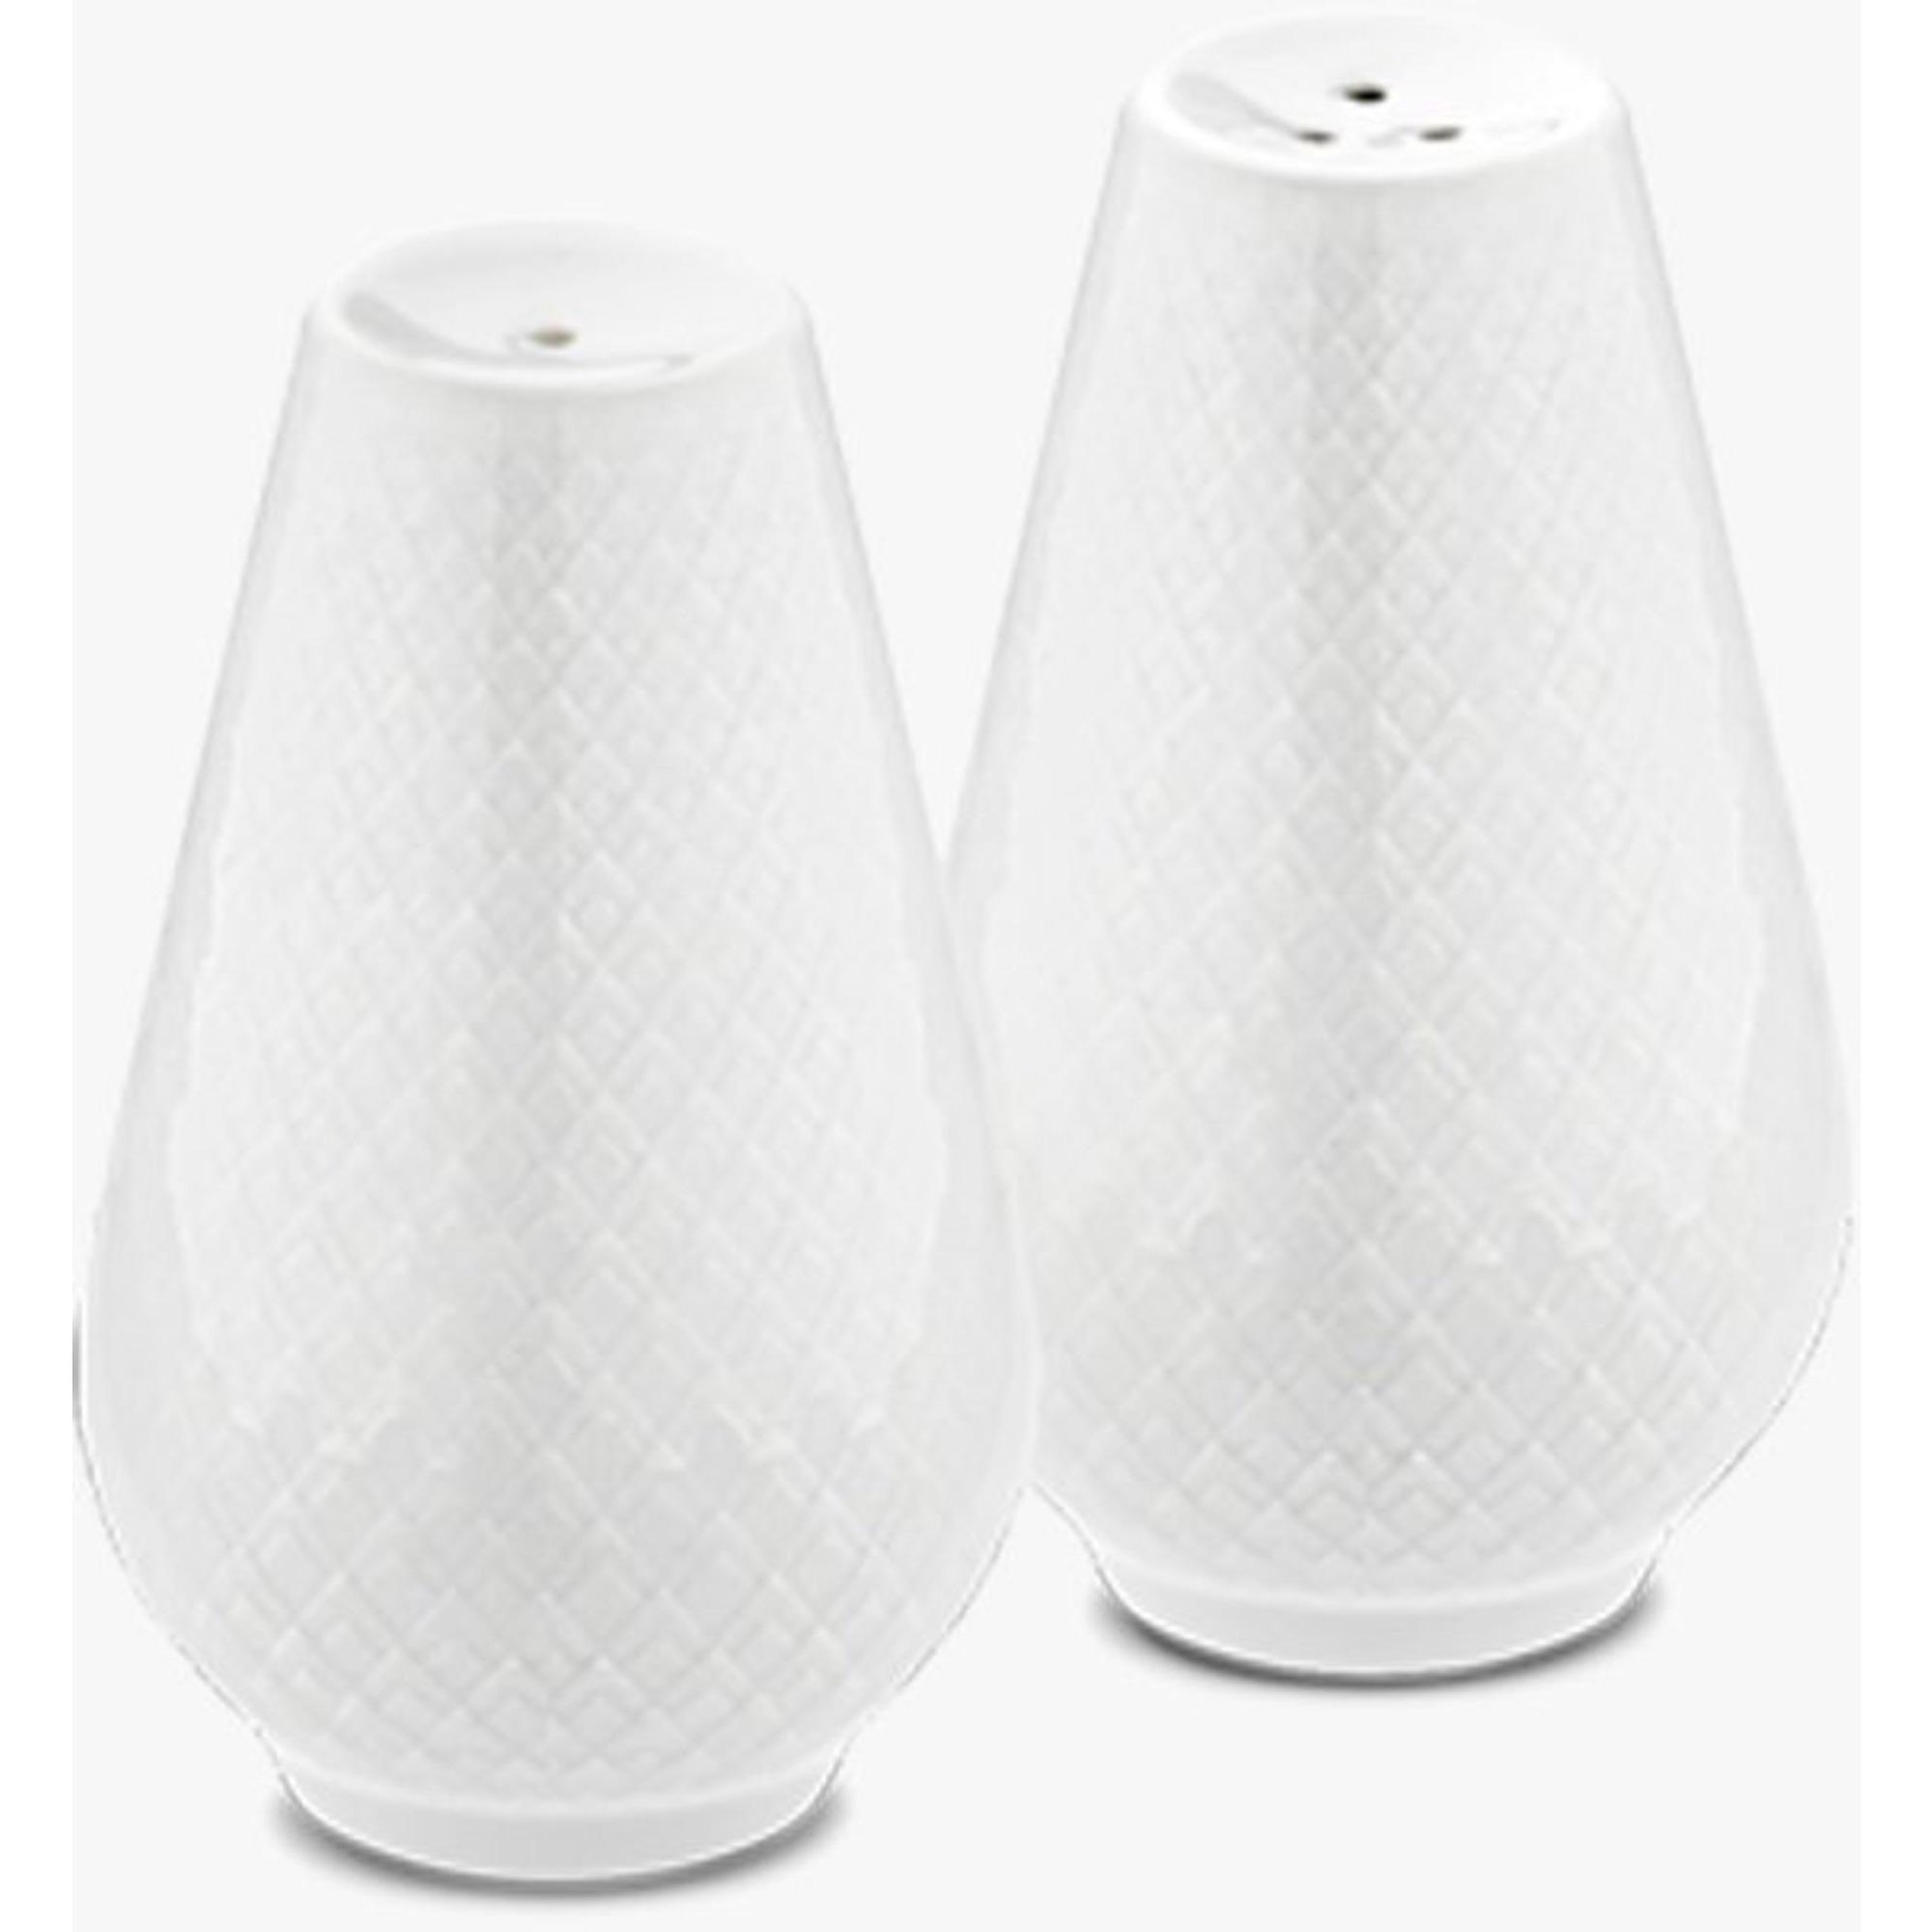 Lyngby Porcelæn Rhombe Salt- och pepparset H7 vit porslin 2